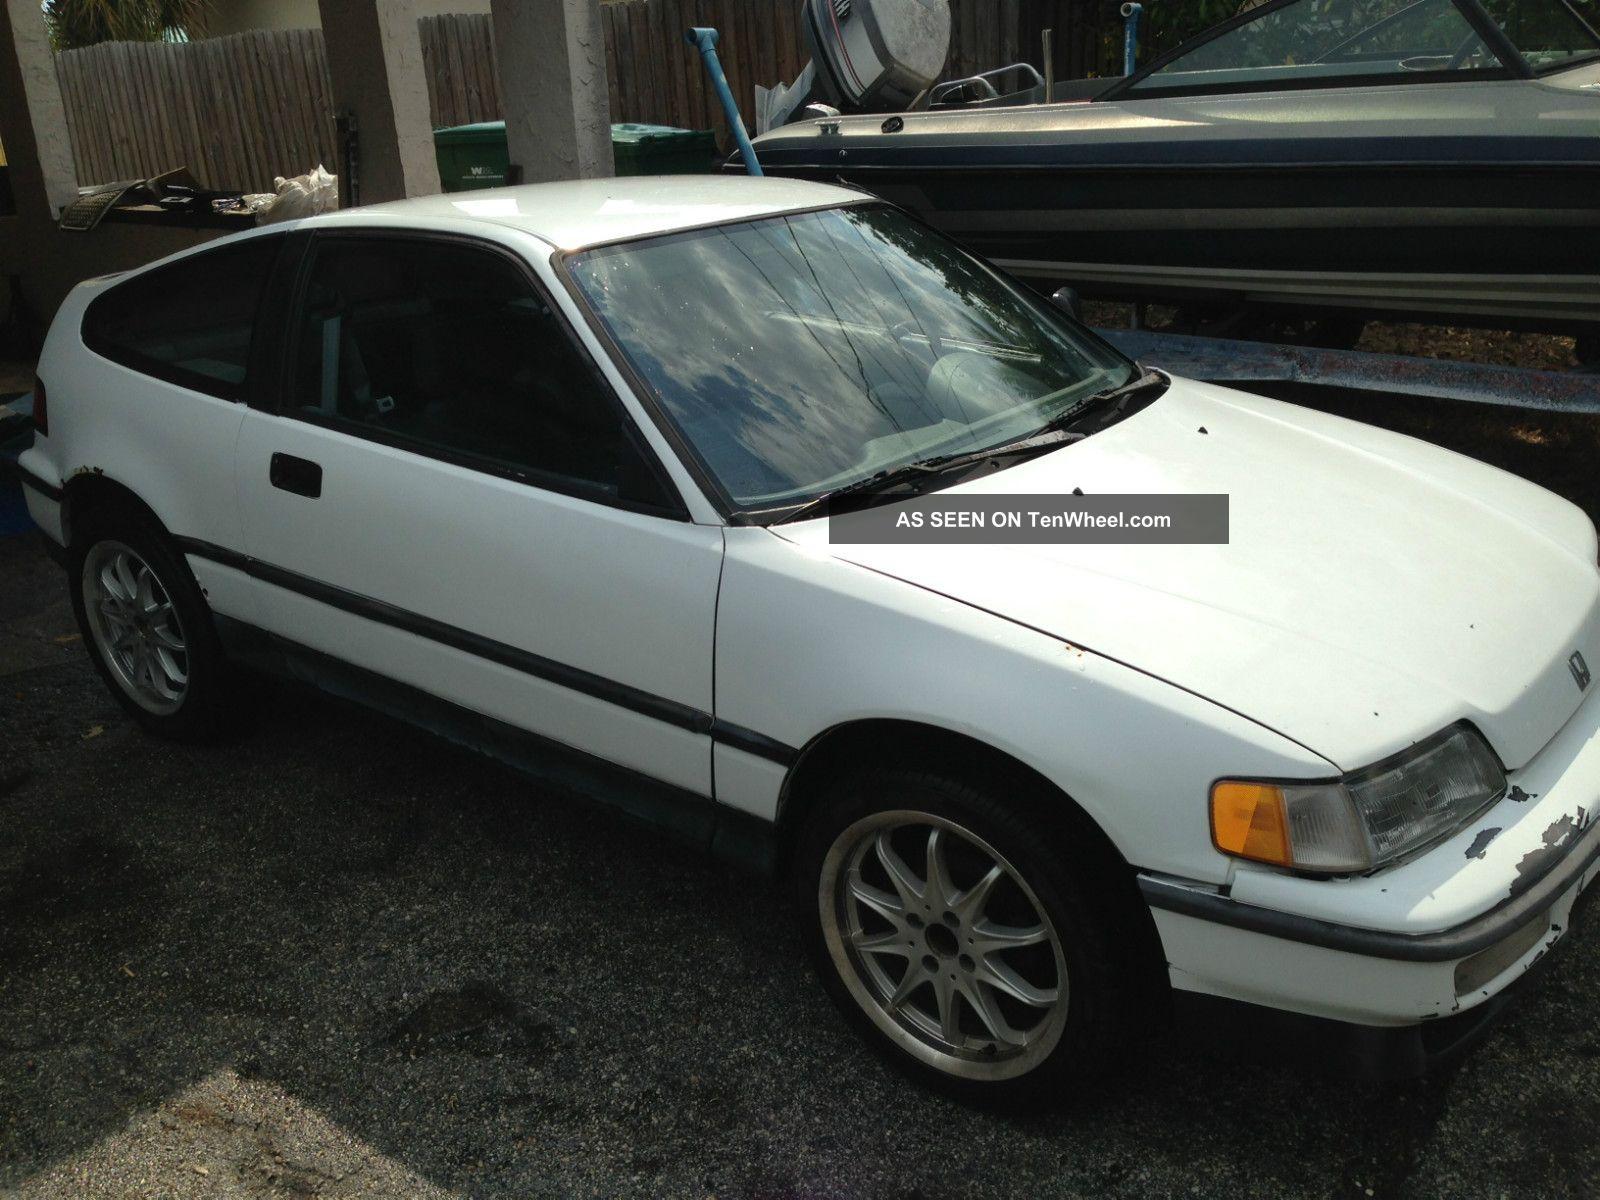 1991 Honda Crx Hf 1.  5 Sohc Stock 5 Speed Manual Unmolested CRX photo